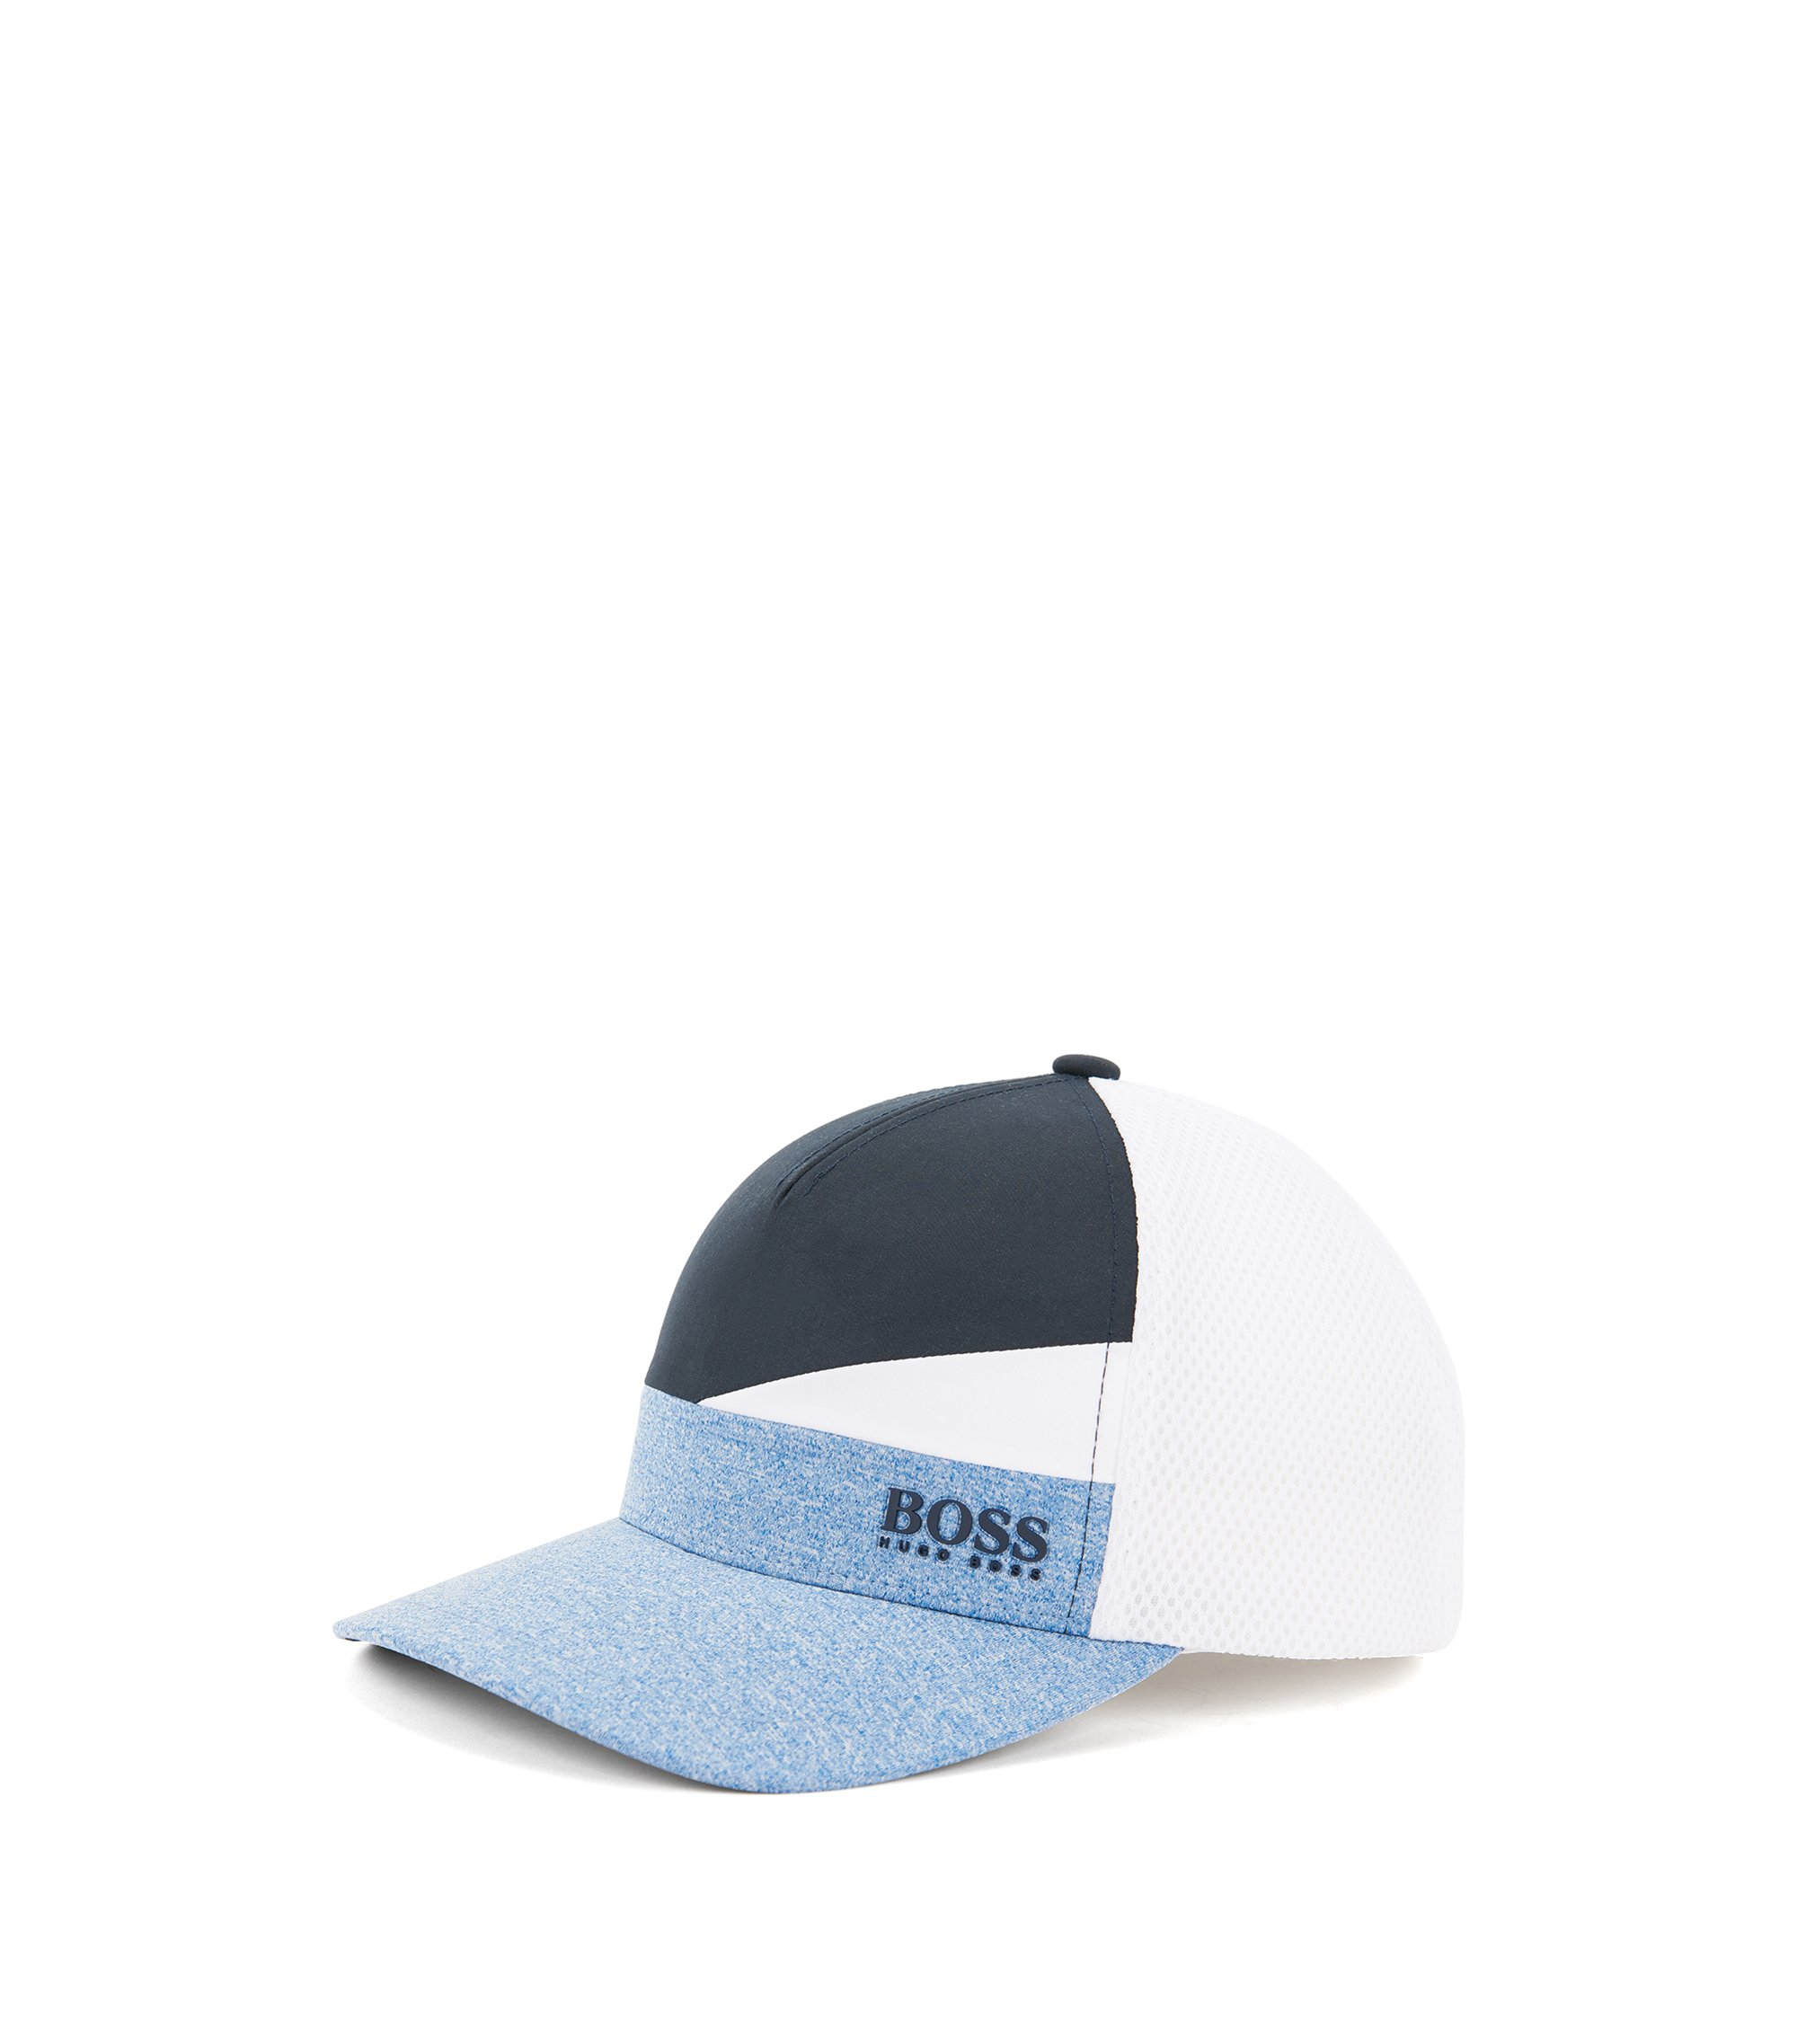 Woven Baseball Cap | Printcap, Blue